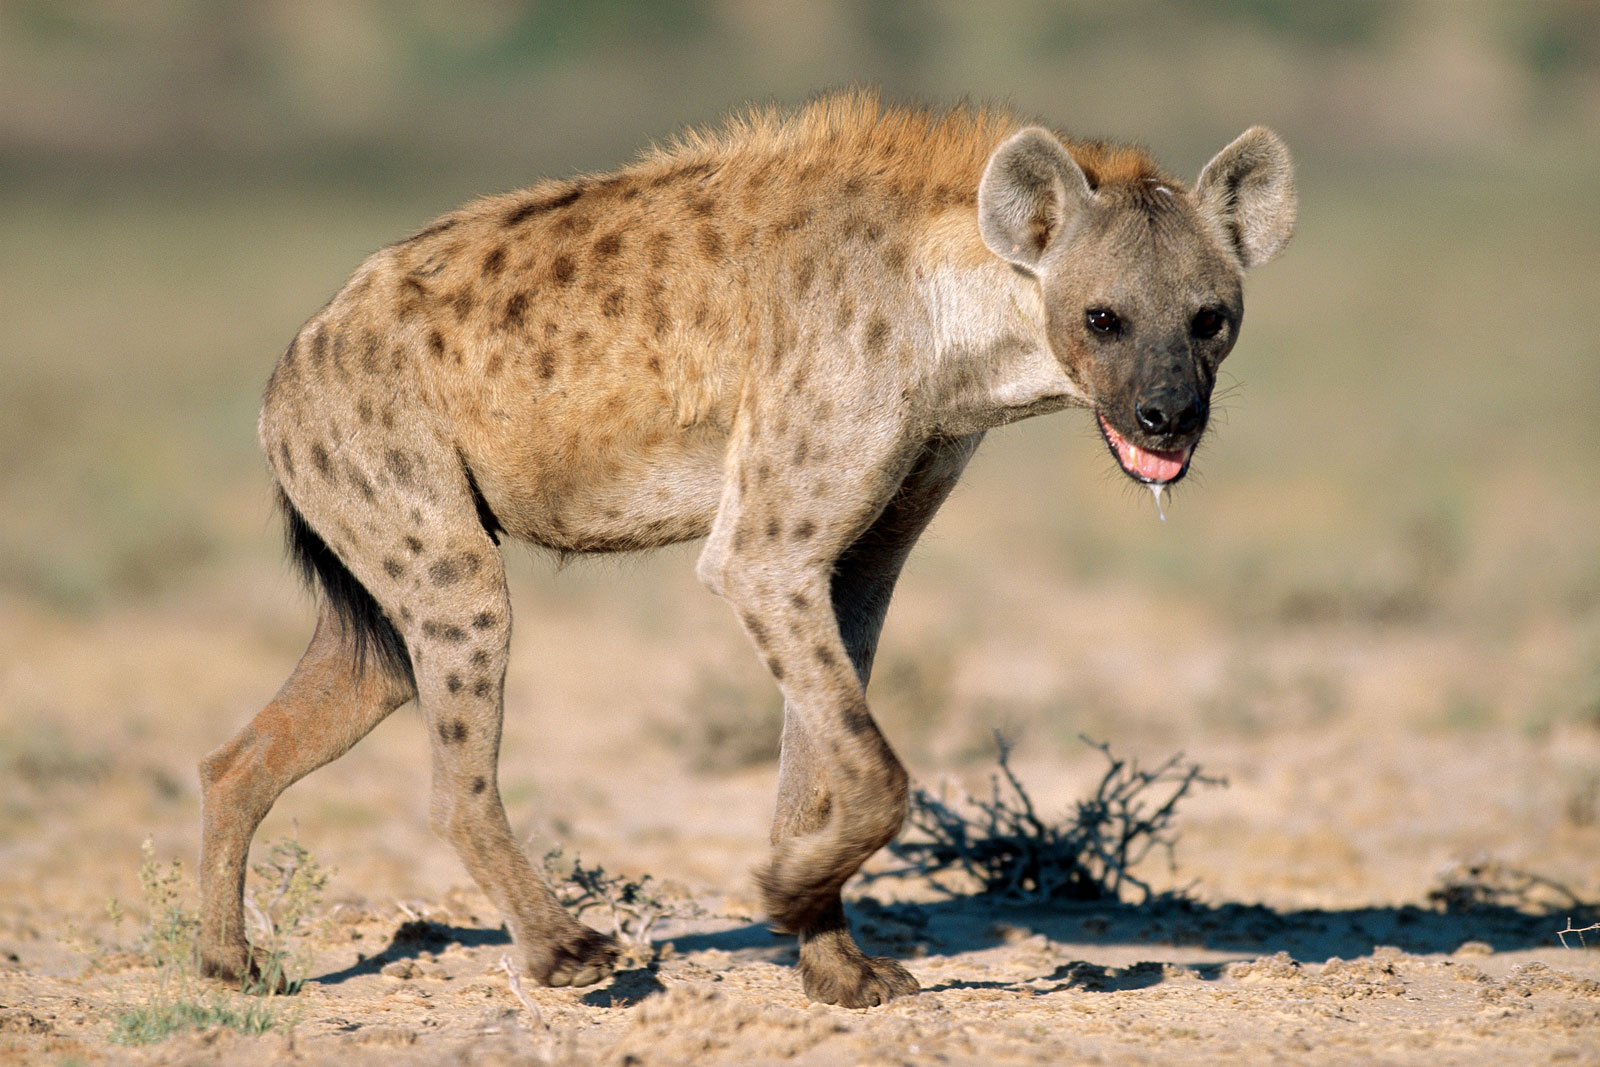 Hyena | The Biggest Animals Kingdom